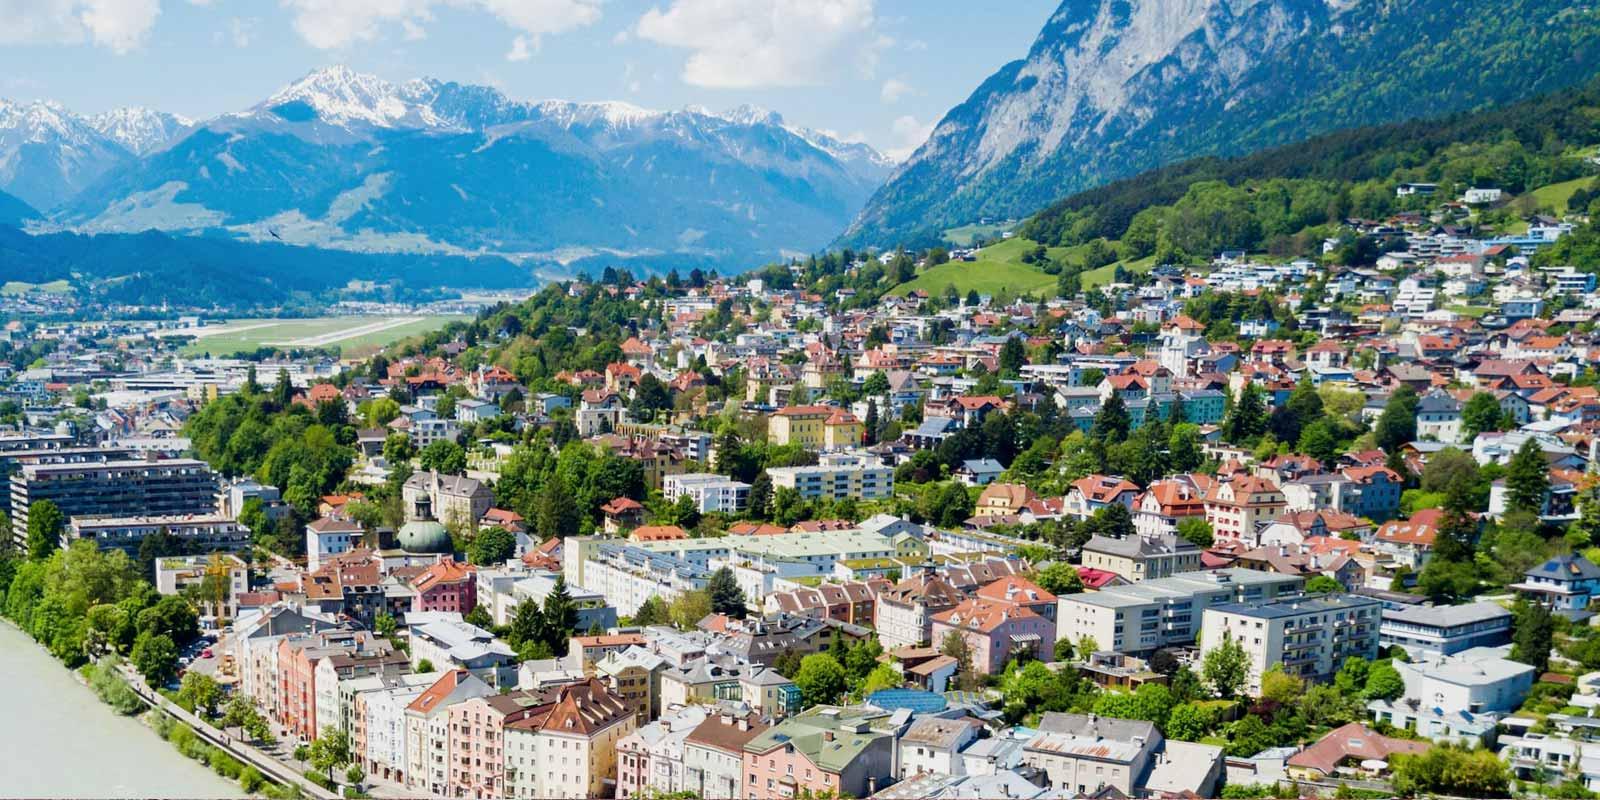 Venice Simplon-Orient-Express Geneva to Innsbruck